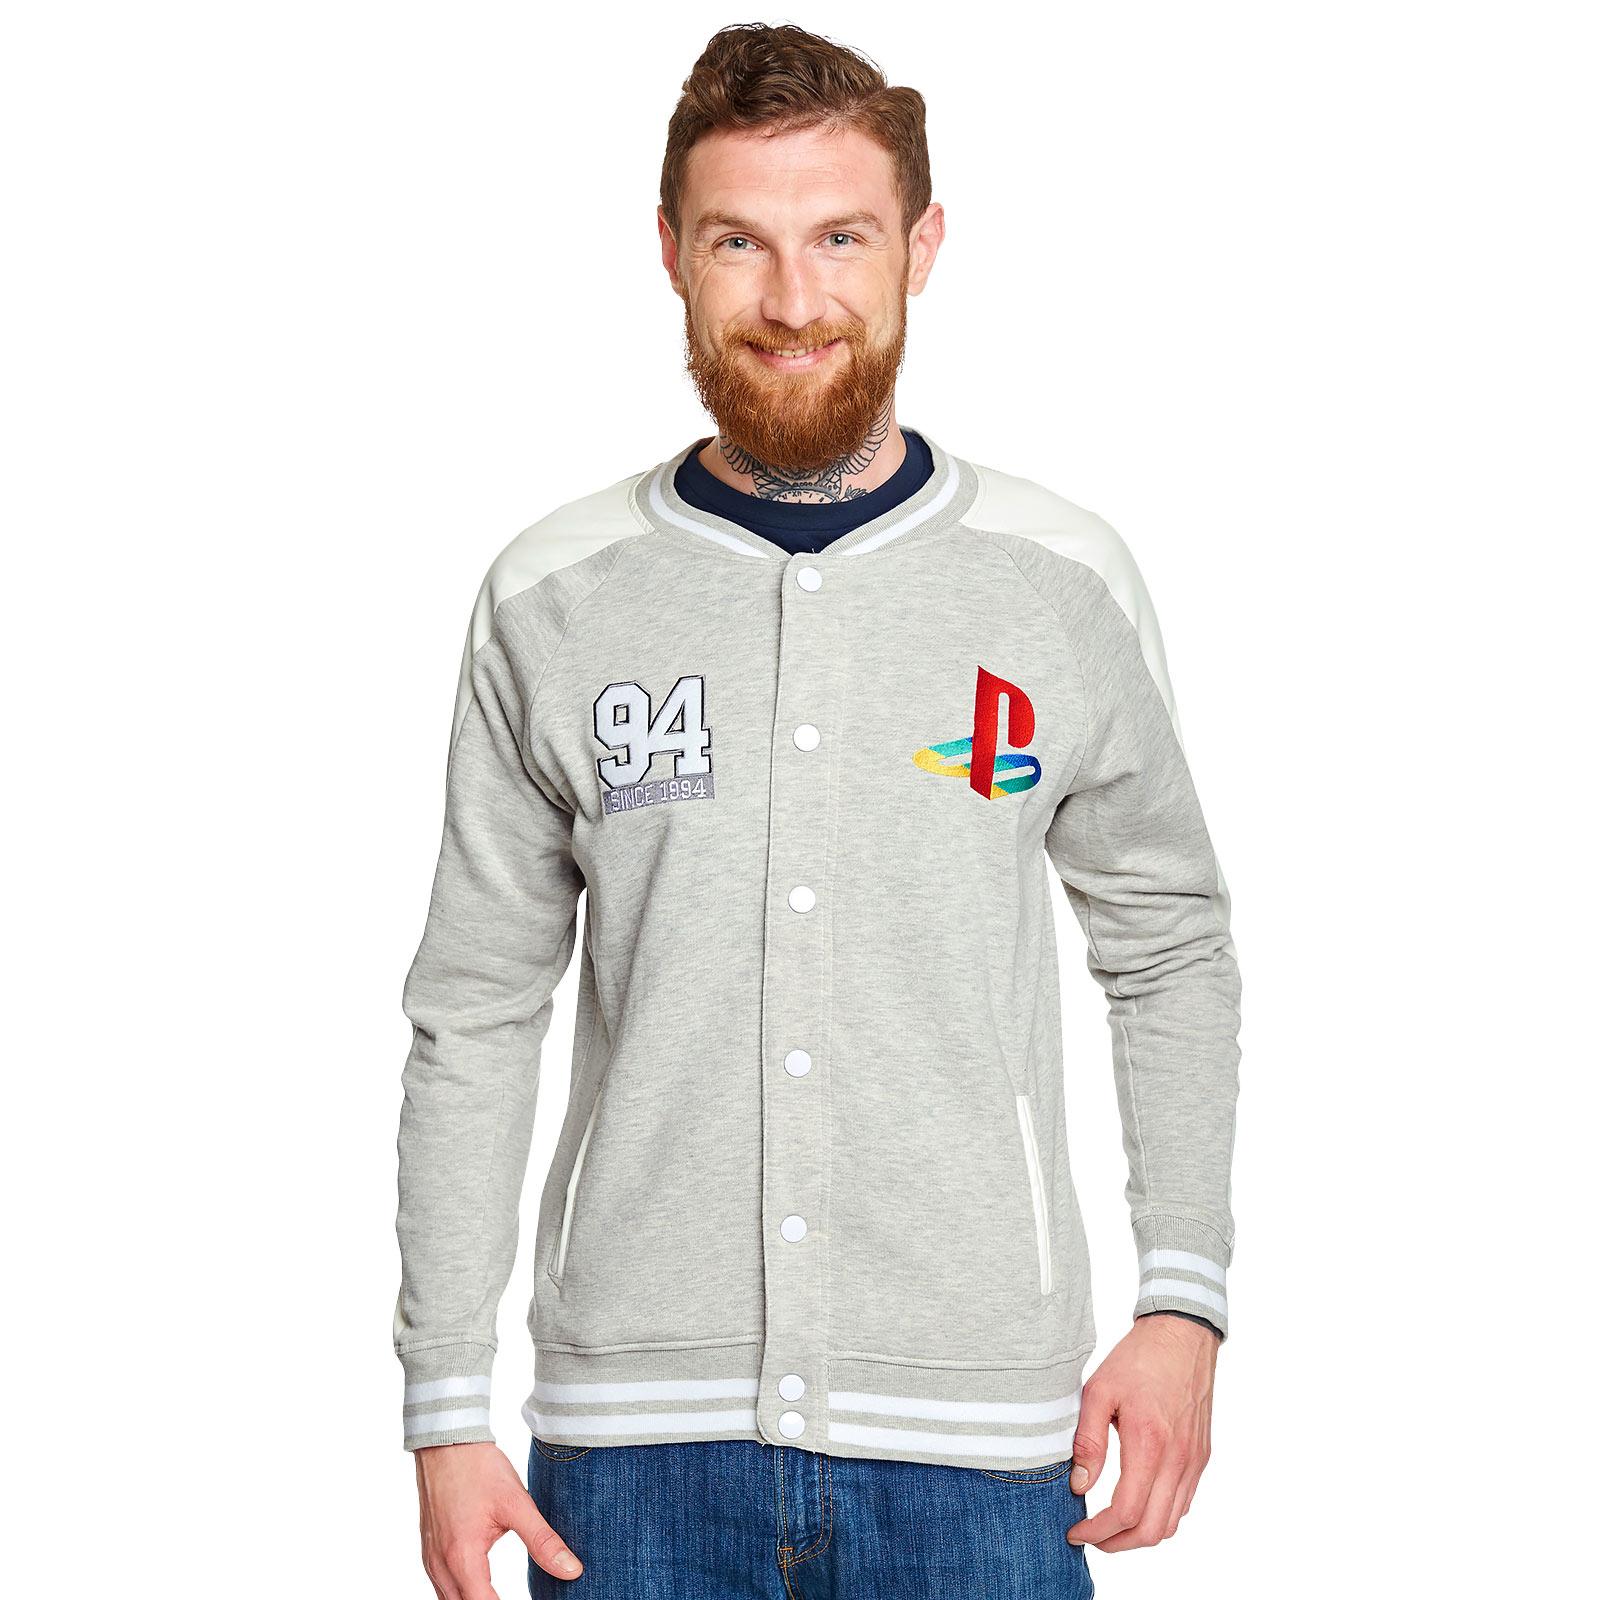 PlayStation - Original 1994 College Jacke